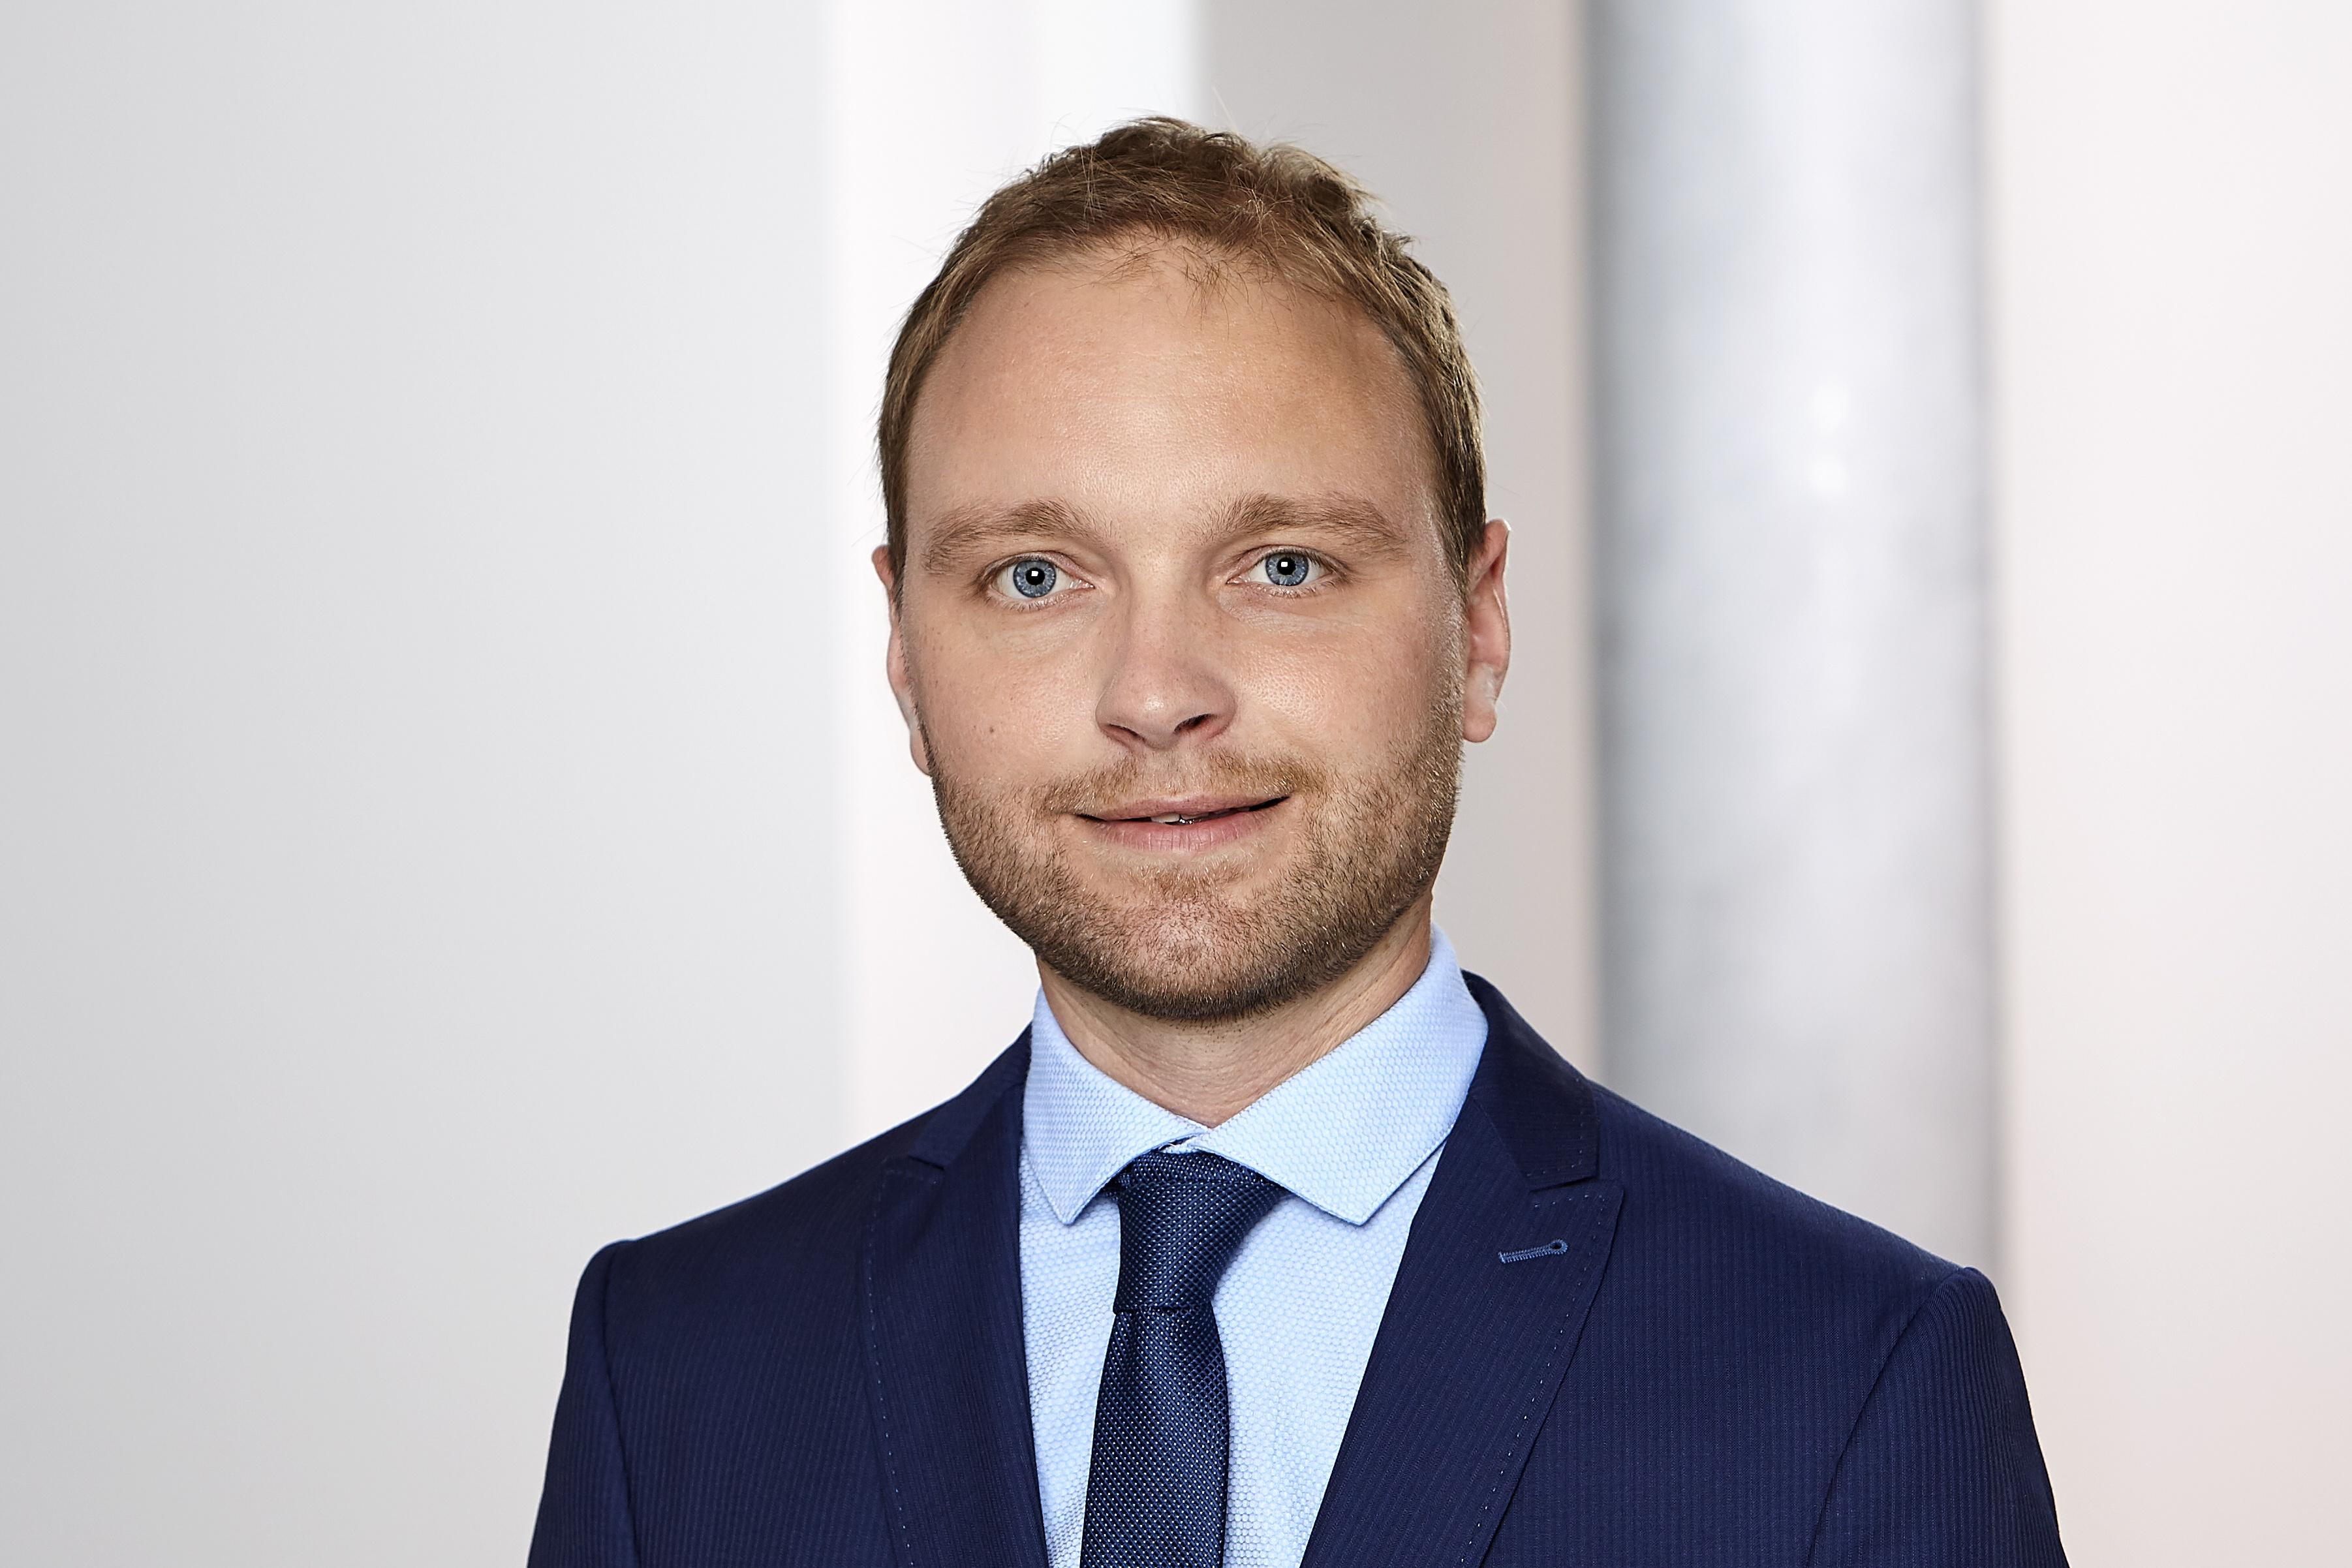 Rechtsanwalt Tobias Goldkamp, Fachanwalt für Erbrecht